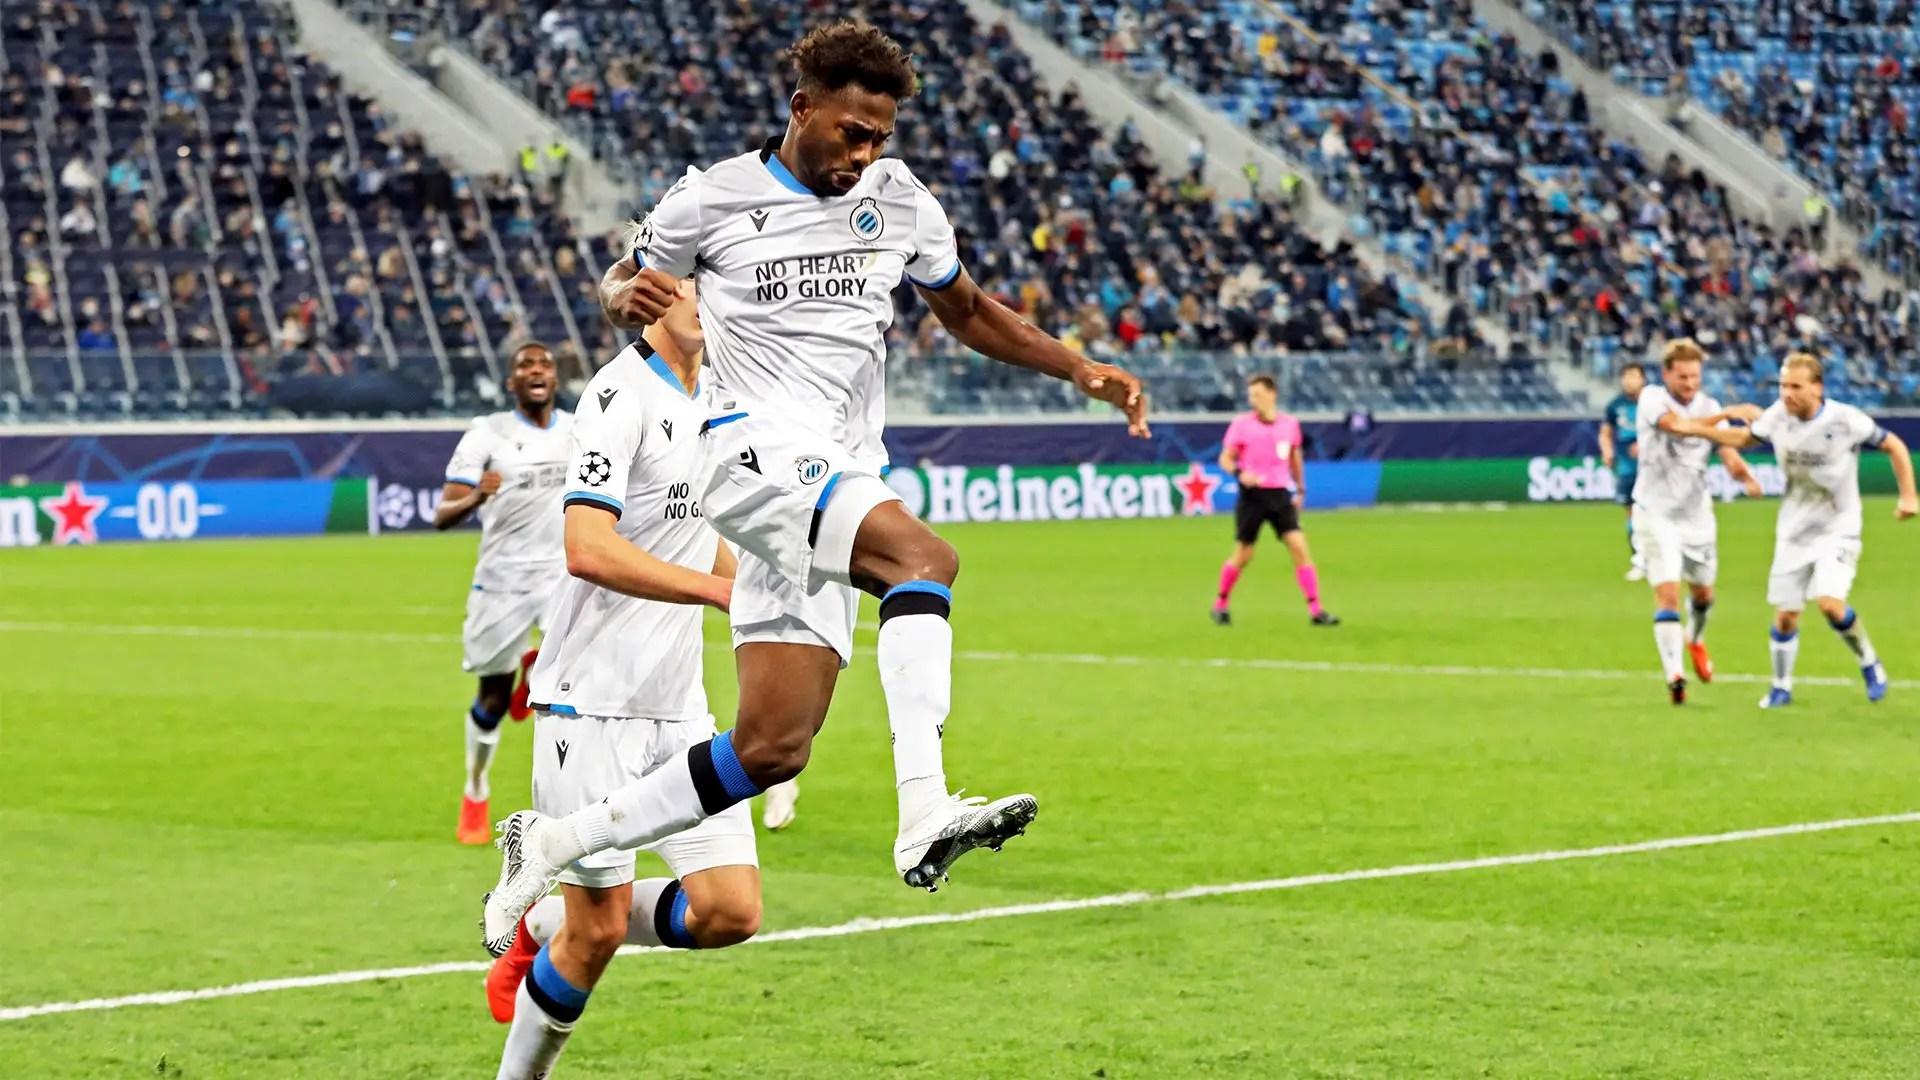 Dennis Targets 6th Champions League Goal In Club Brugge – Lazio Clash